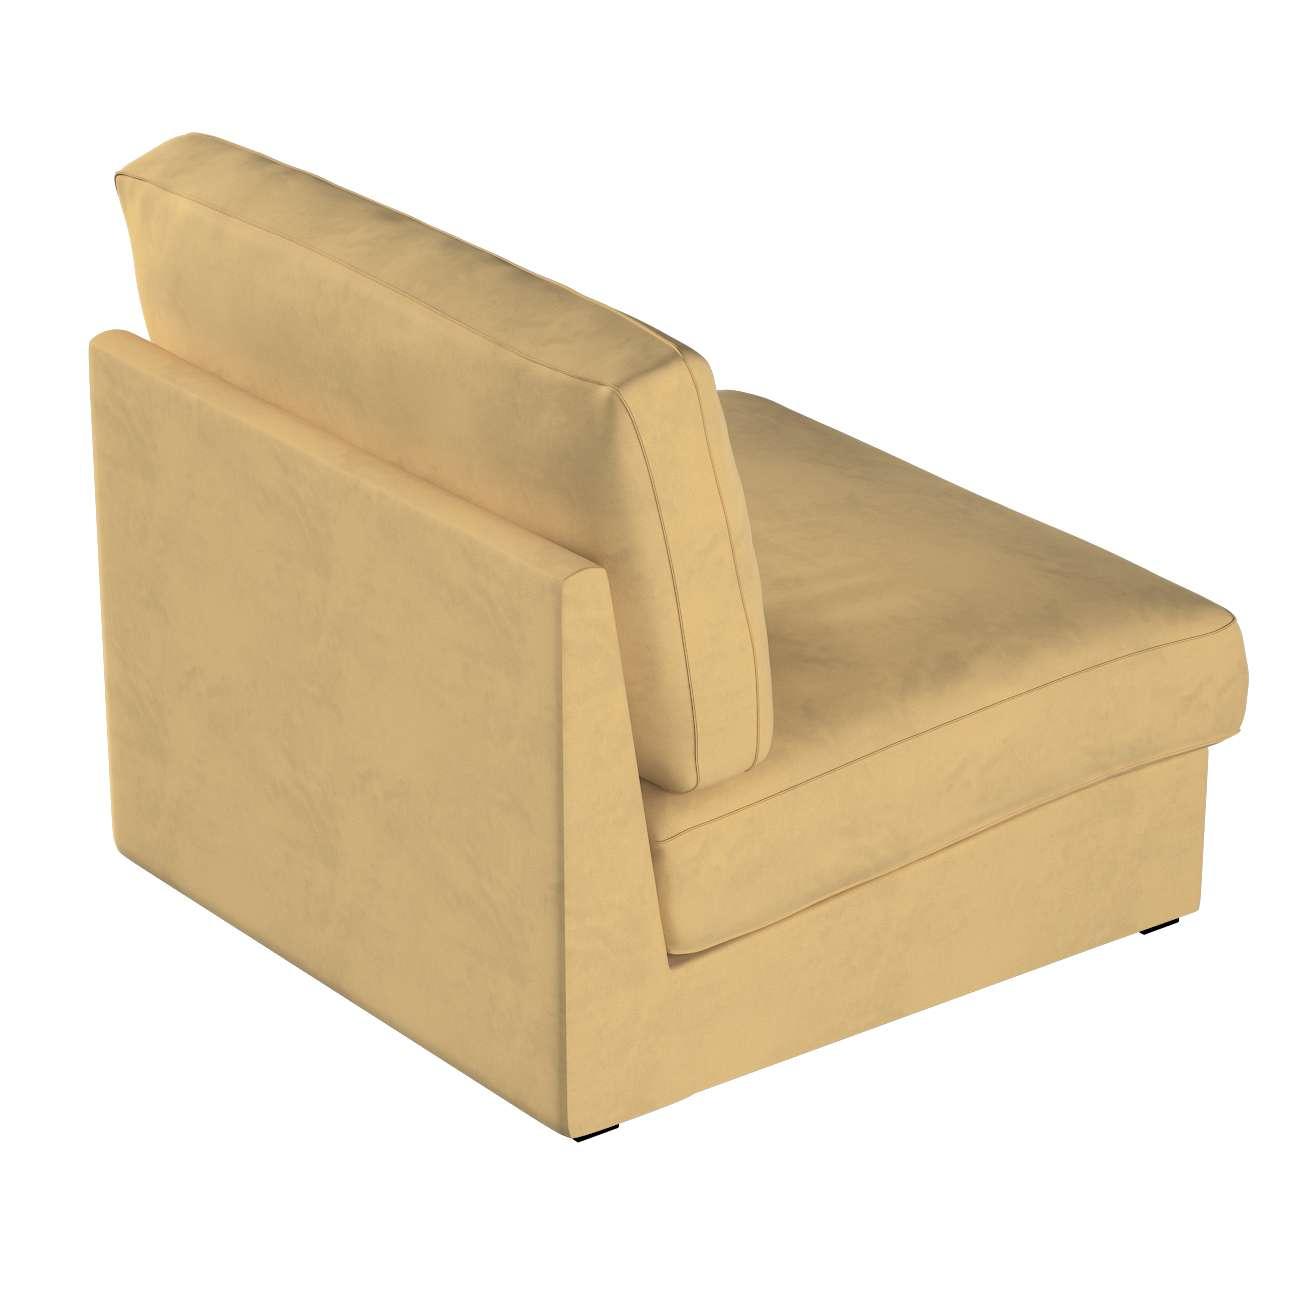 Pokrowiec na fotel Kivik w kolekcji Living, tkanina: 160-93